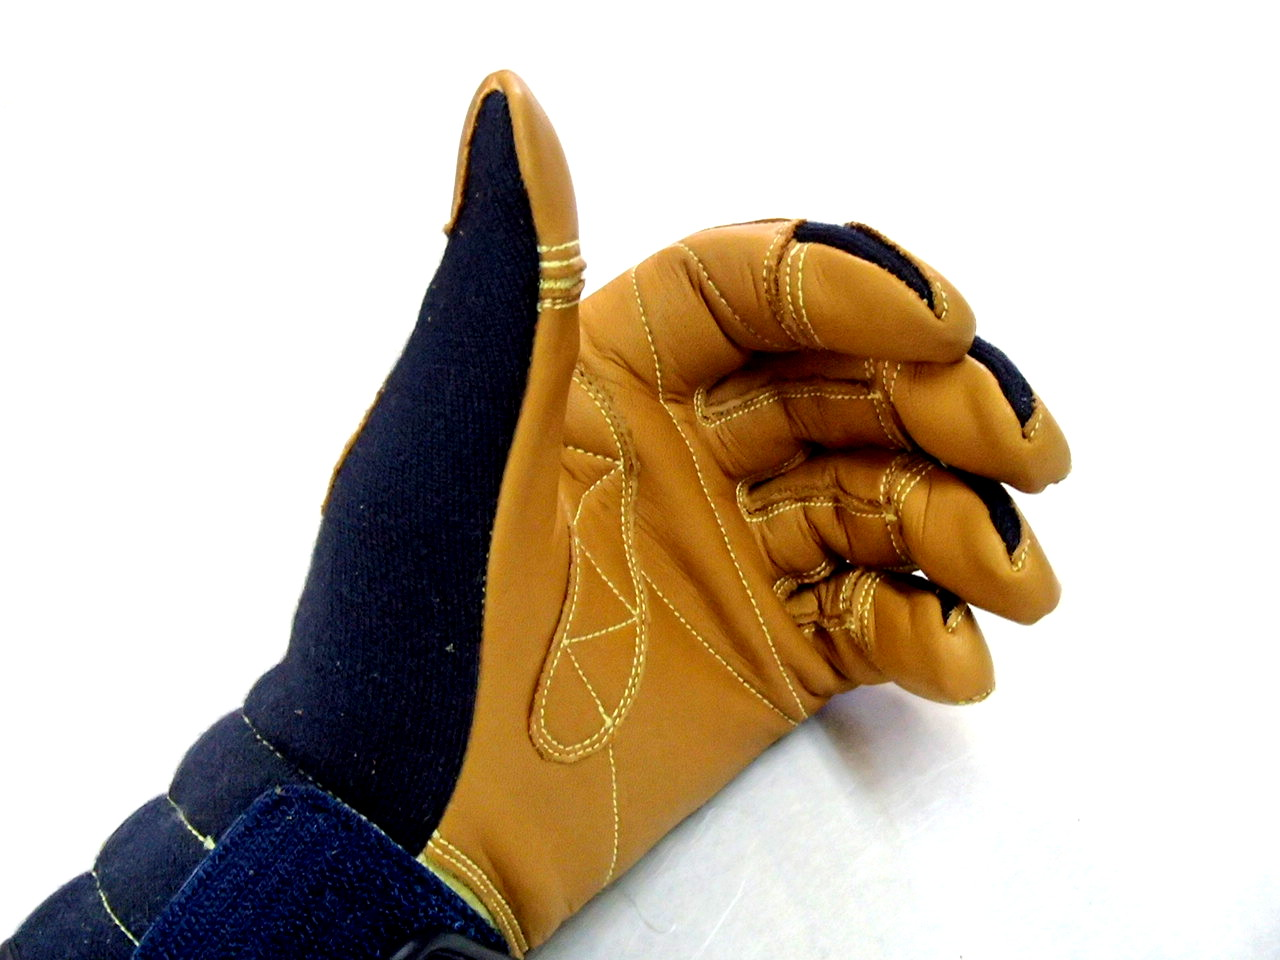 TONBO ケブラー製防火手袋 ネービー K-TFG5 L